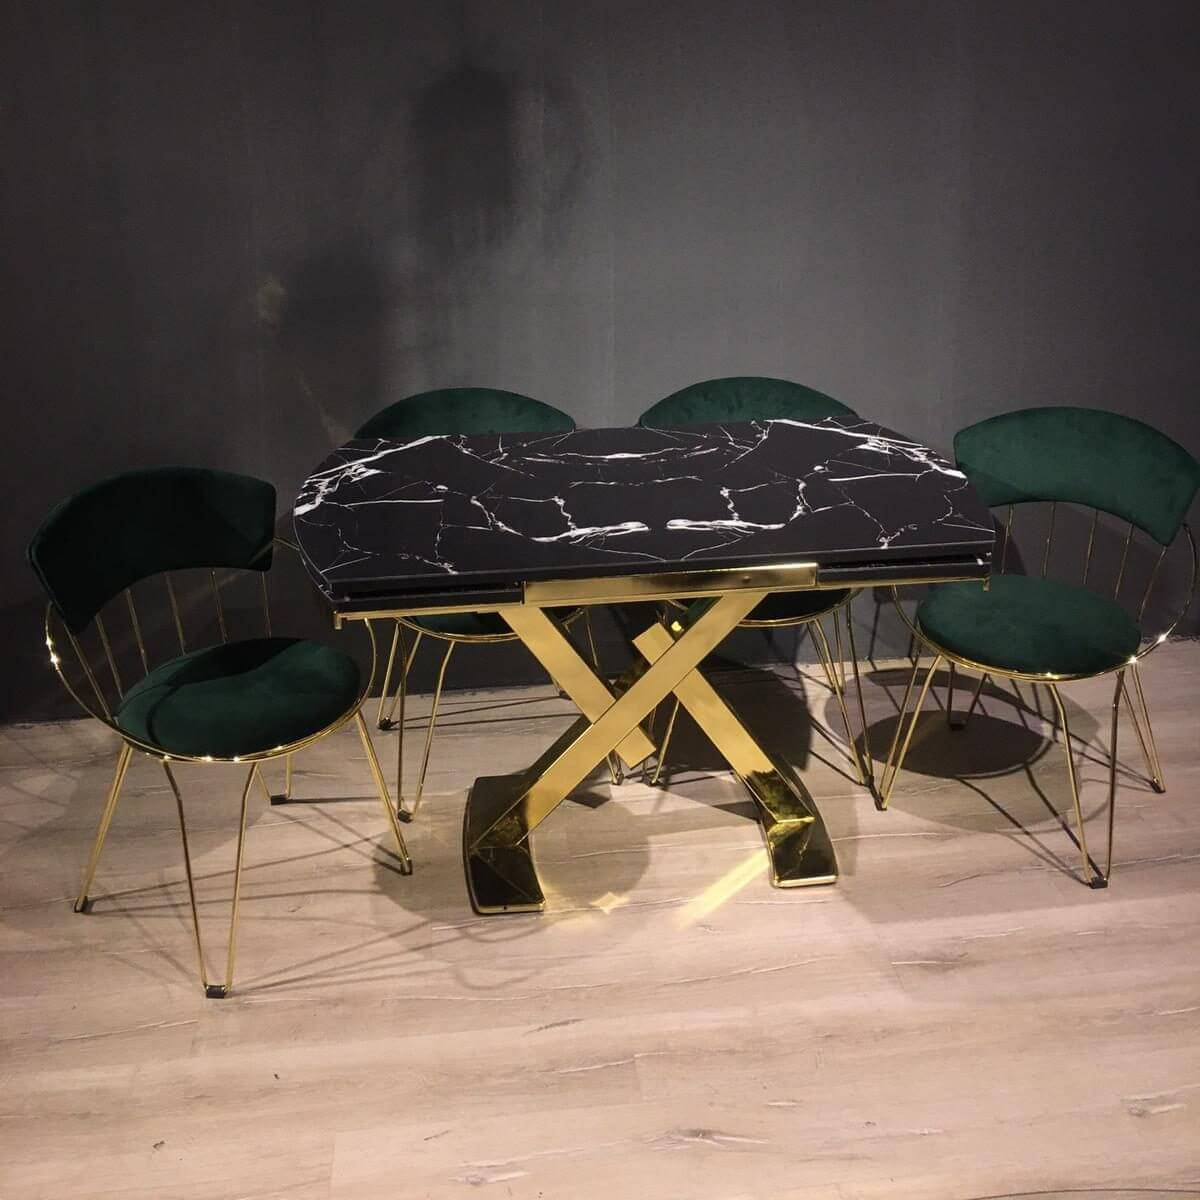 X-ayakli-metal-acilir-masa-sandalye-takimi-46213